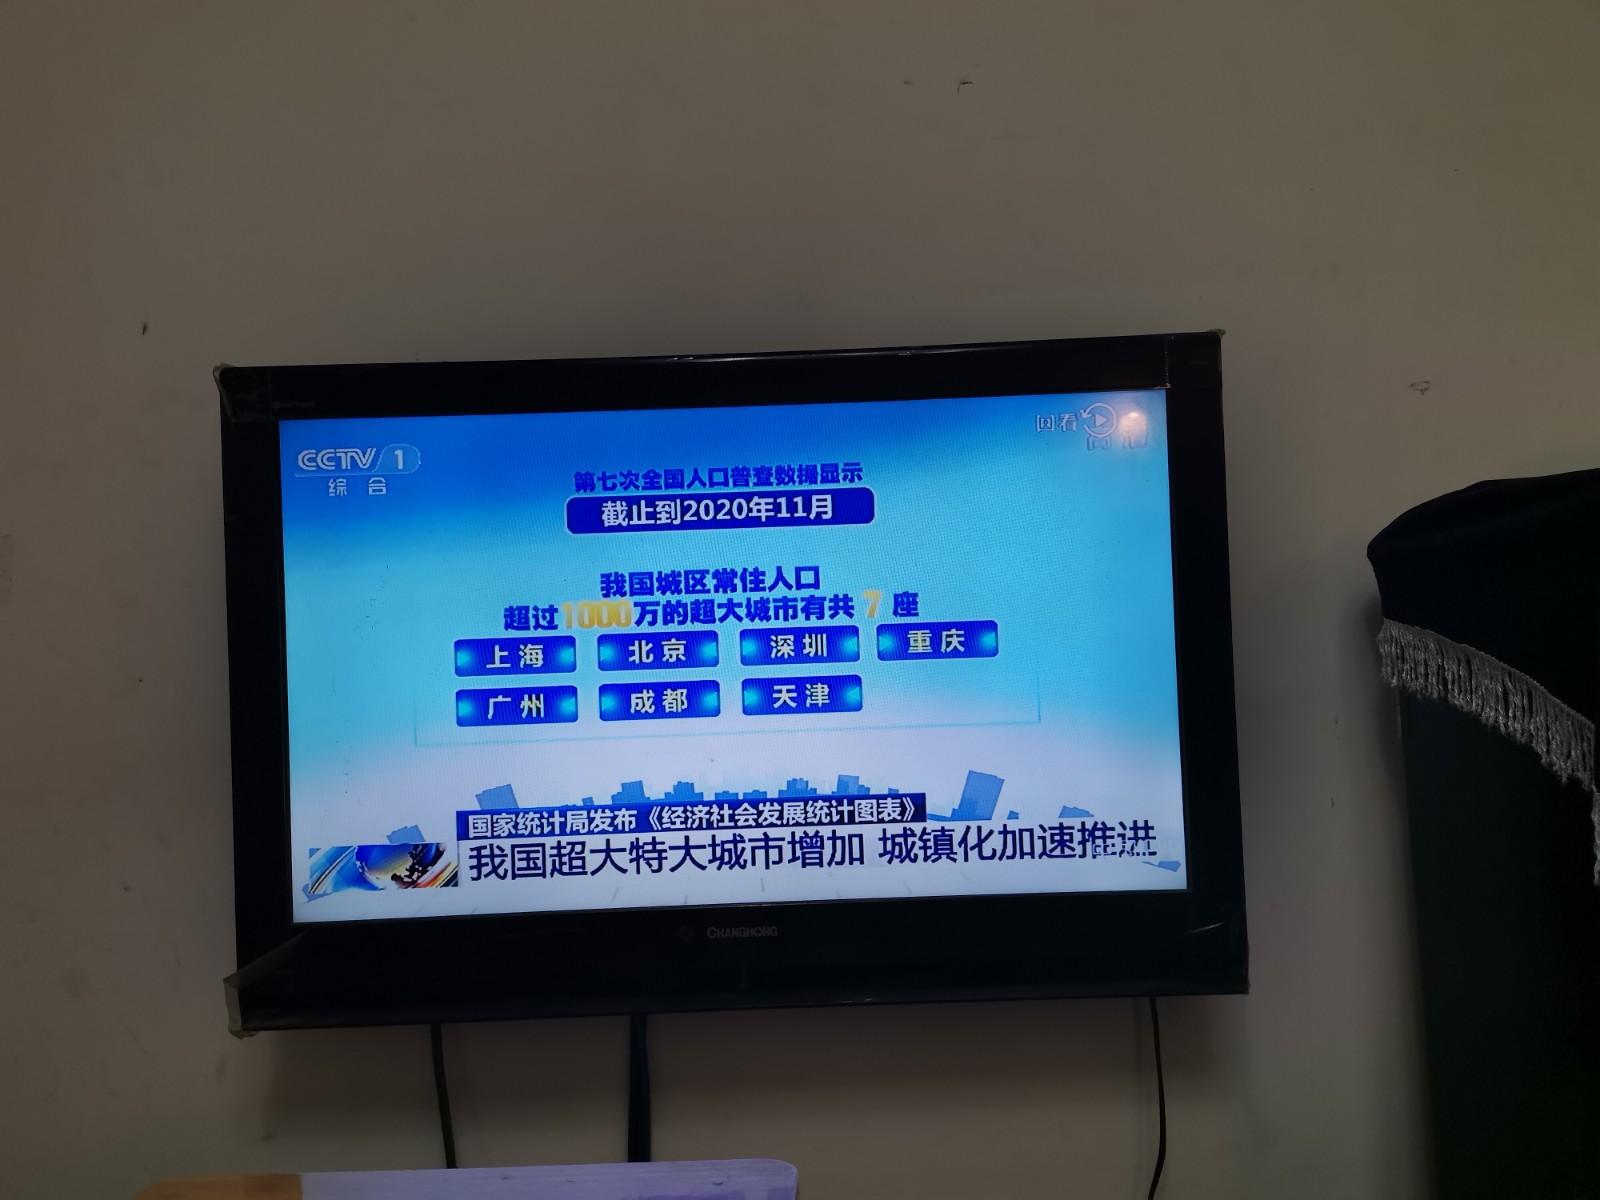 CCTV1,CCTV2,CCTV4,cctv13同一天报道超